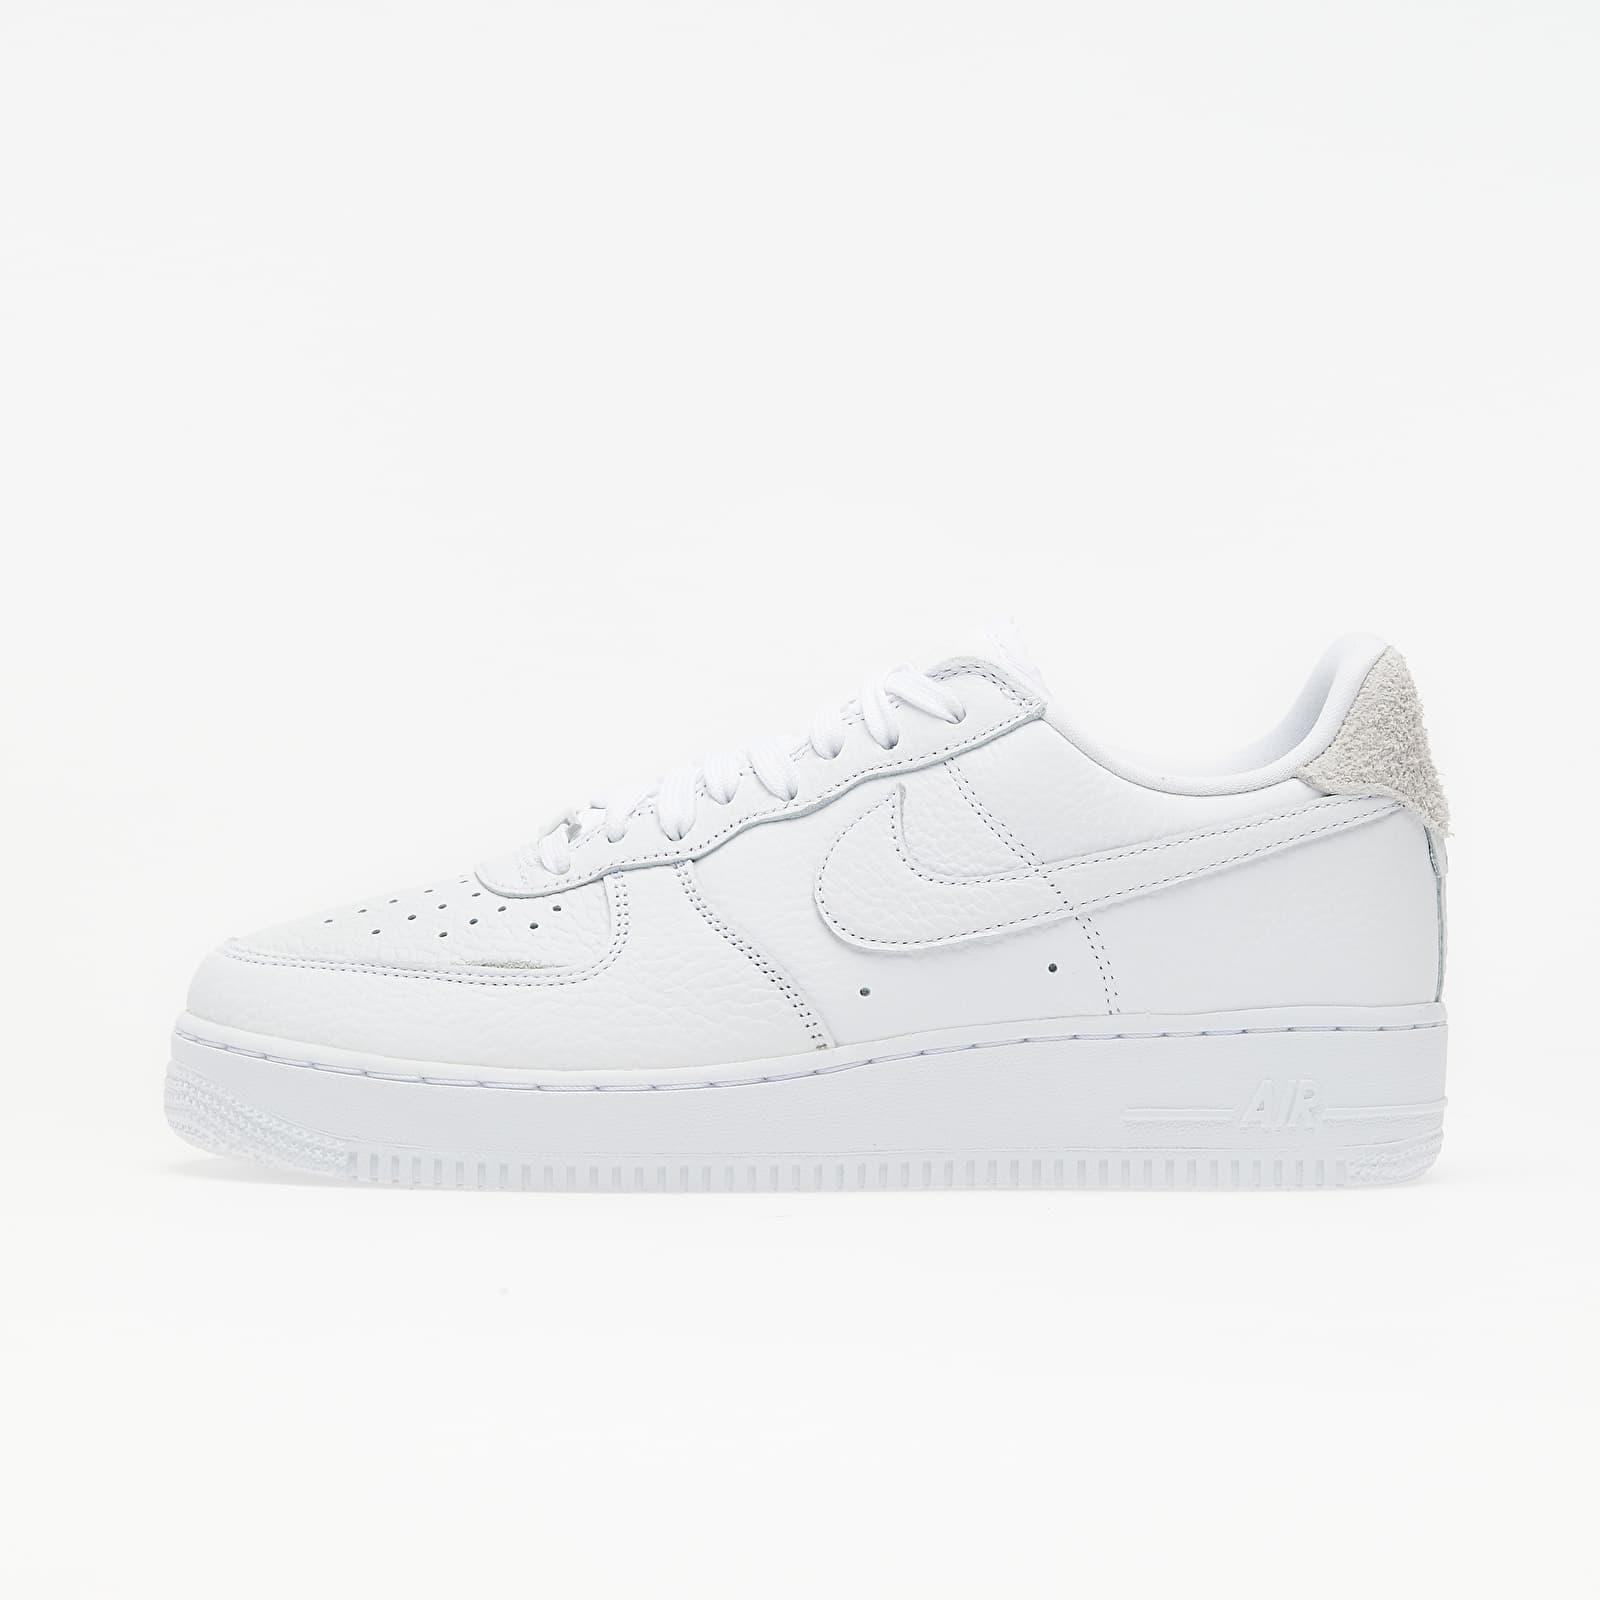 Nike Air Force 1 '07 Craft White/ White-Summit White-Vast Grey CN2873-101